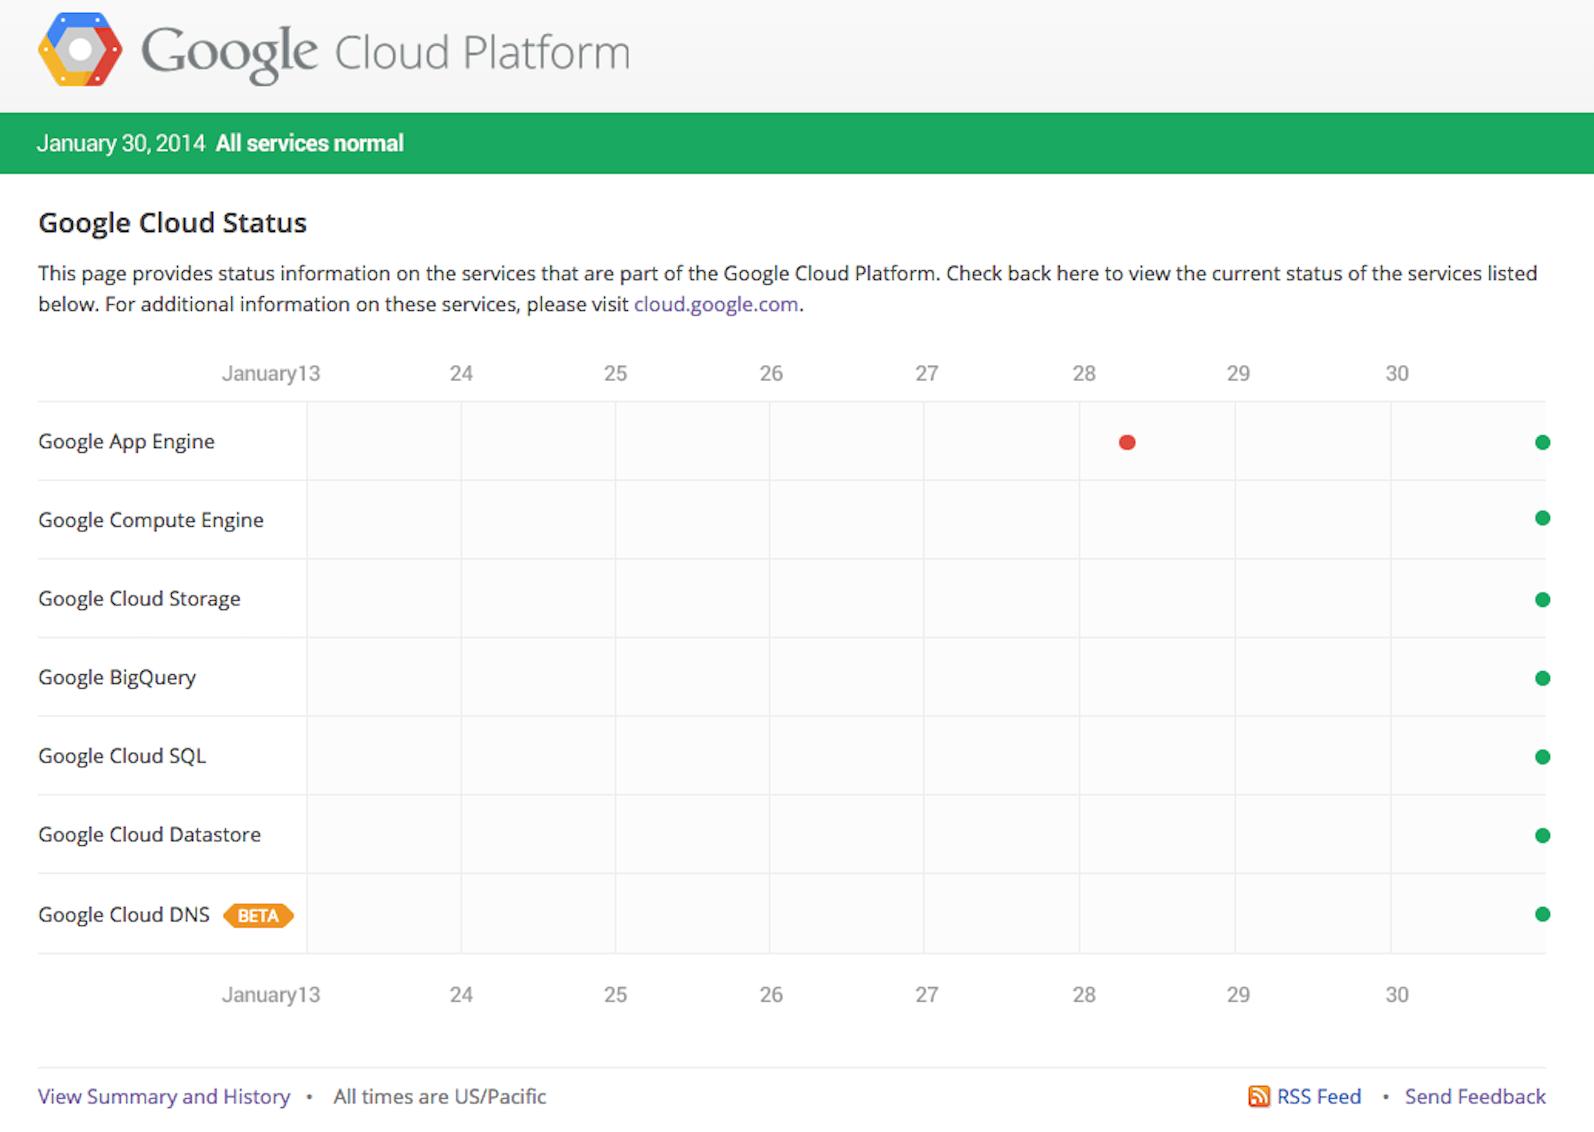 Introducing Google Cloud Platform Status Dashboard